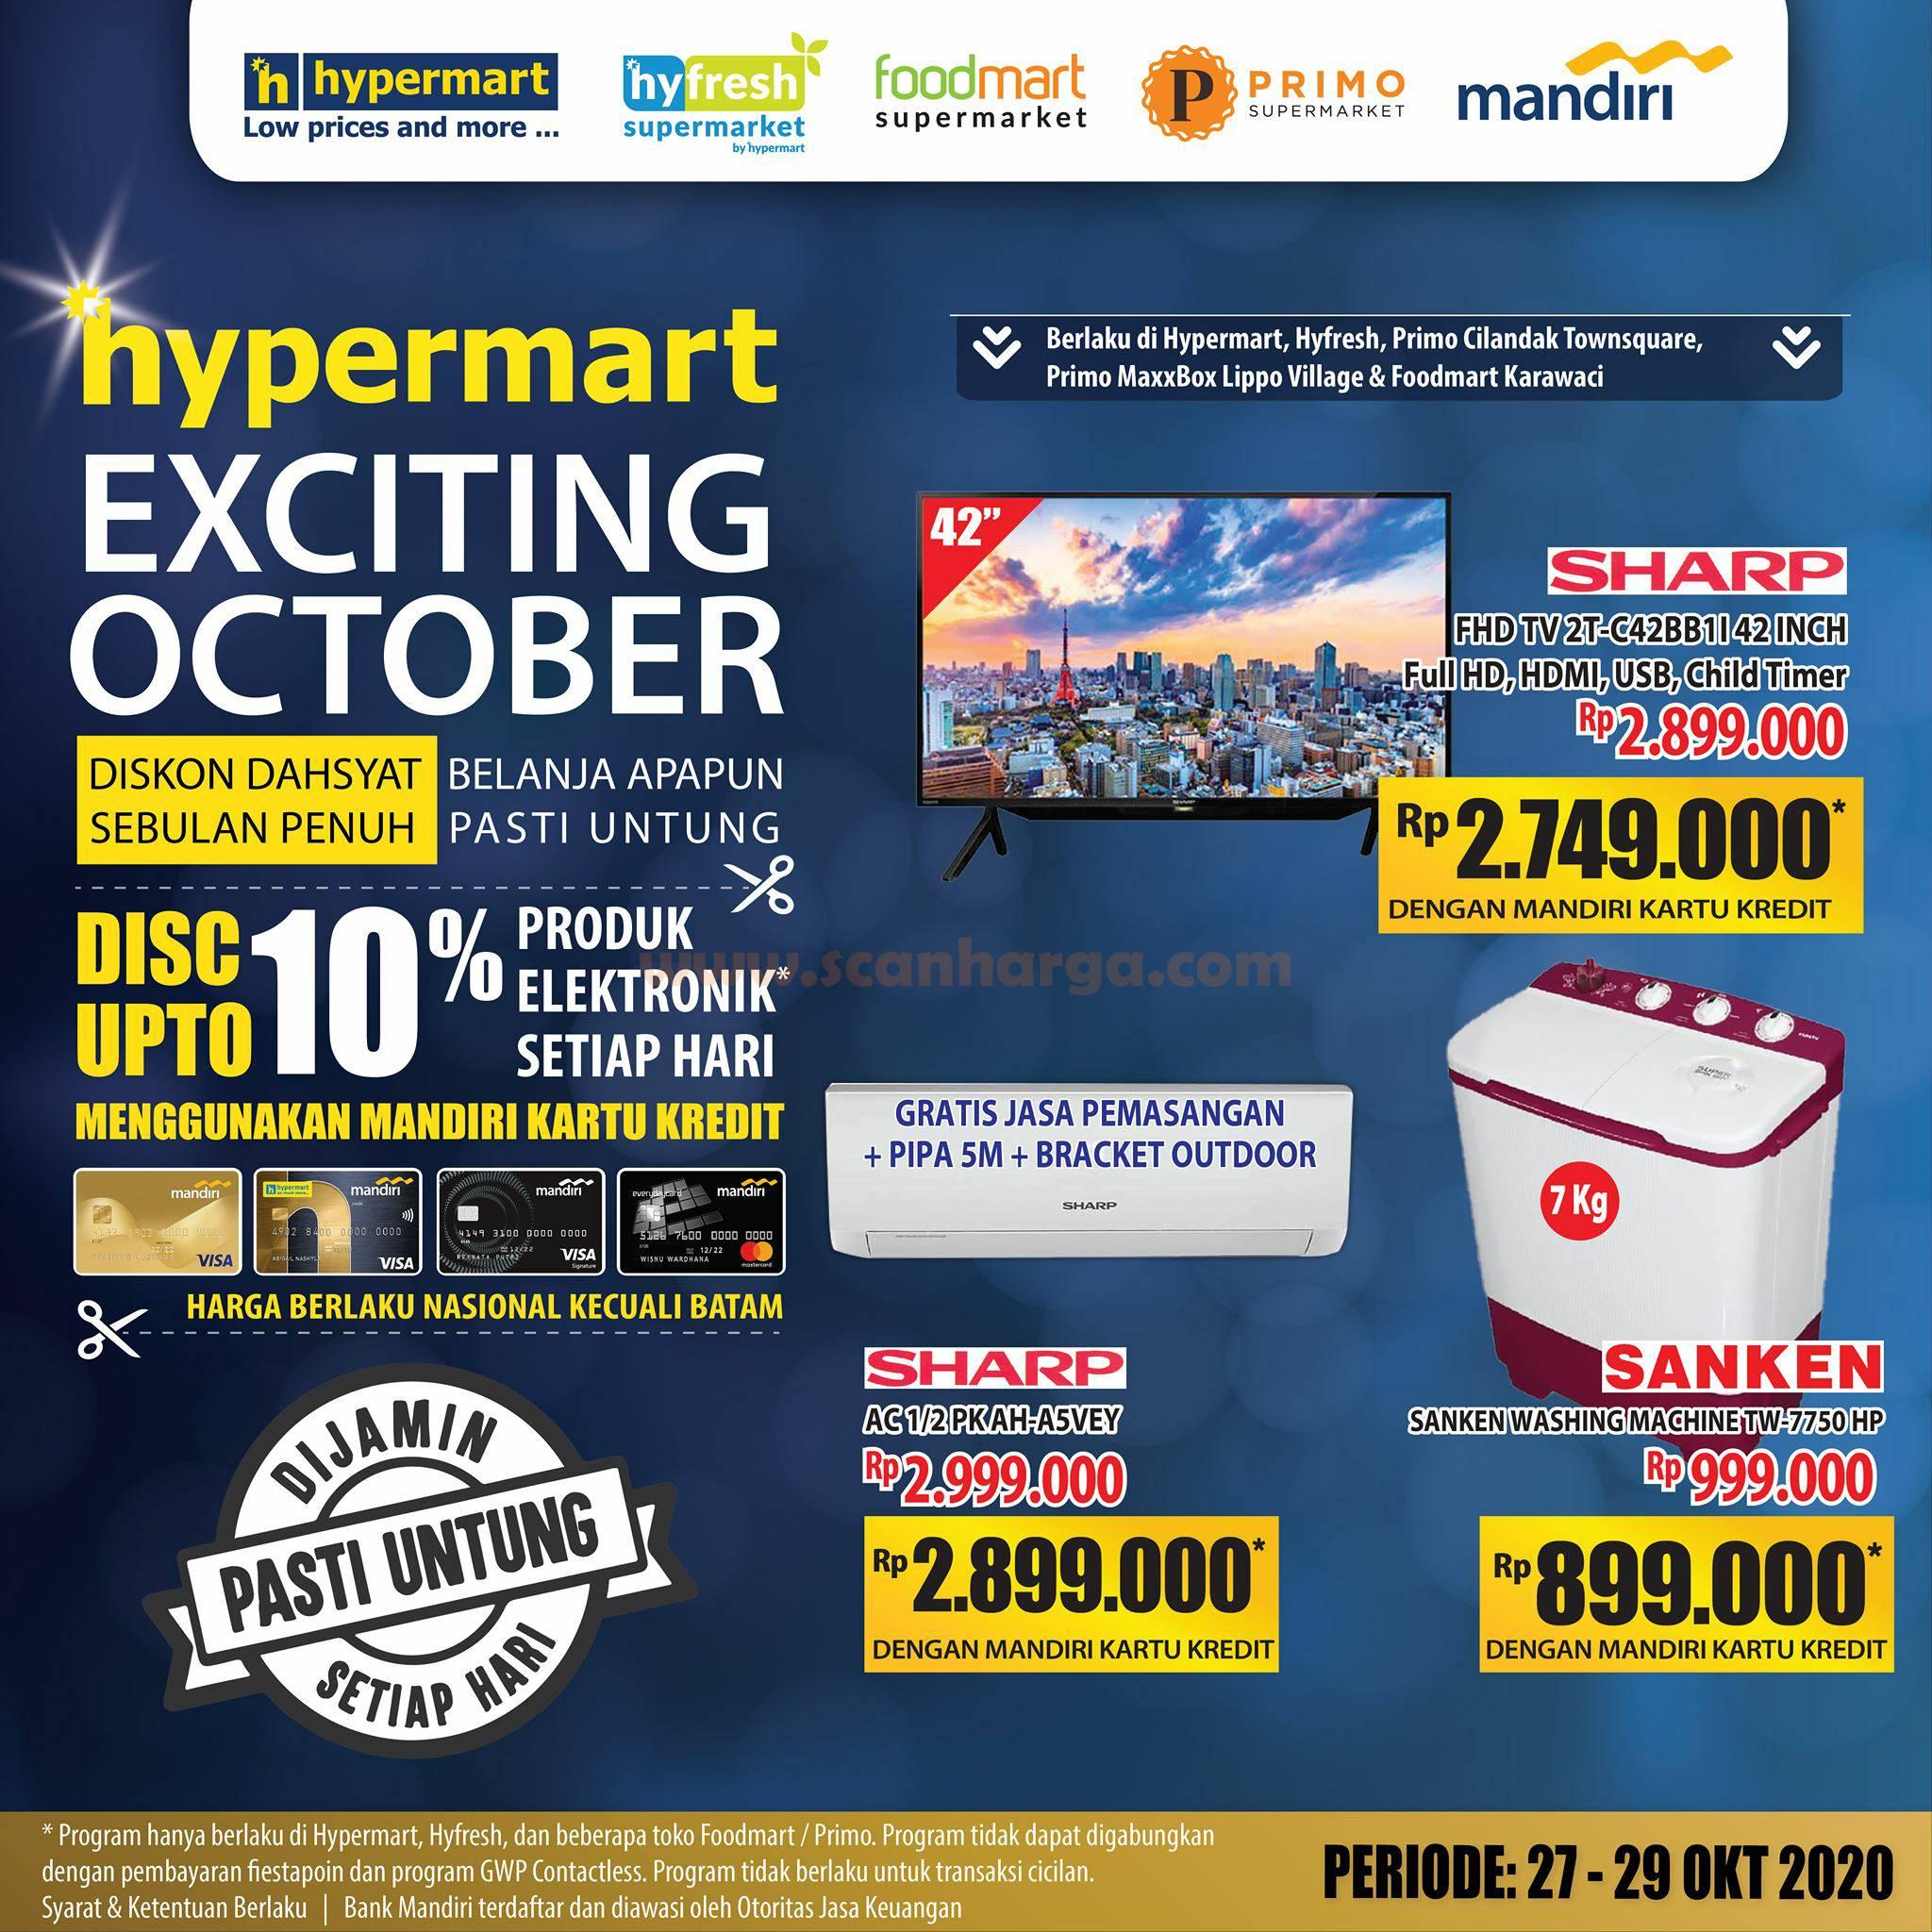 Promo Hypermart Exciting Oktober Diskon 10% produk Elektronik dengan Kartu Kredit Mandiri